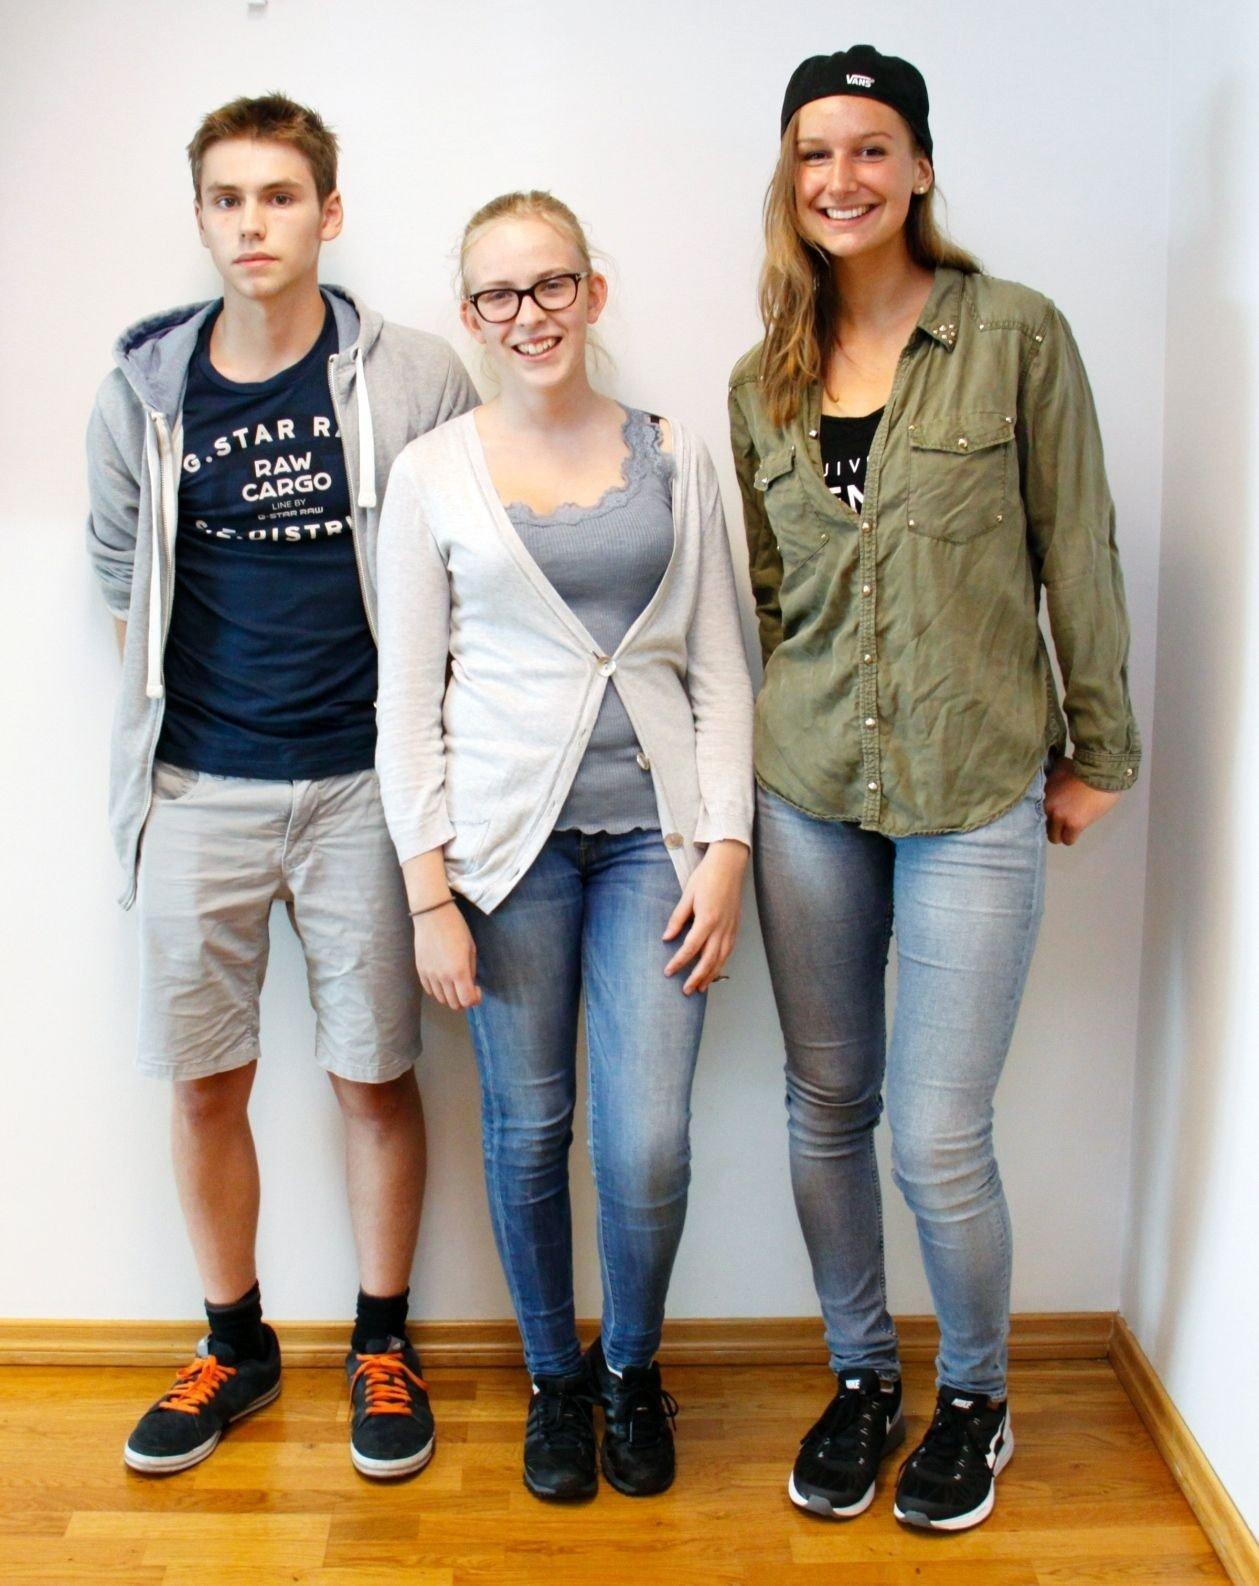 OSLOS BESTE: Simon Ingebrigt Golombek (Elvebakken), Johanna Ulvedal Marstrander (Foss) og Maria Isabel Bang Jensen (Ullern) gleder seg til Danmarkstur og talentcamp.